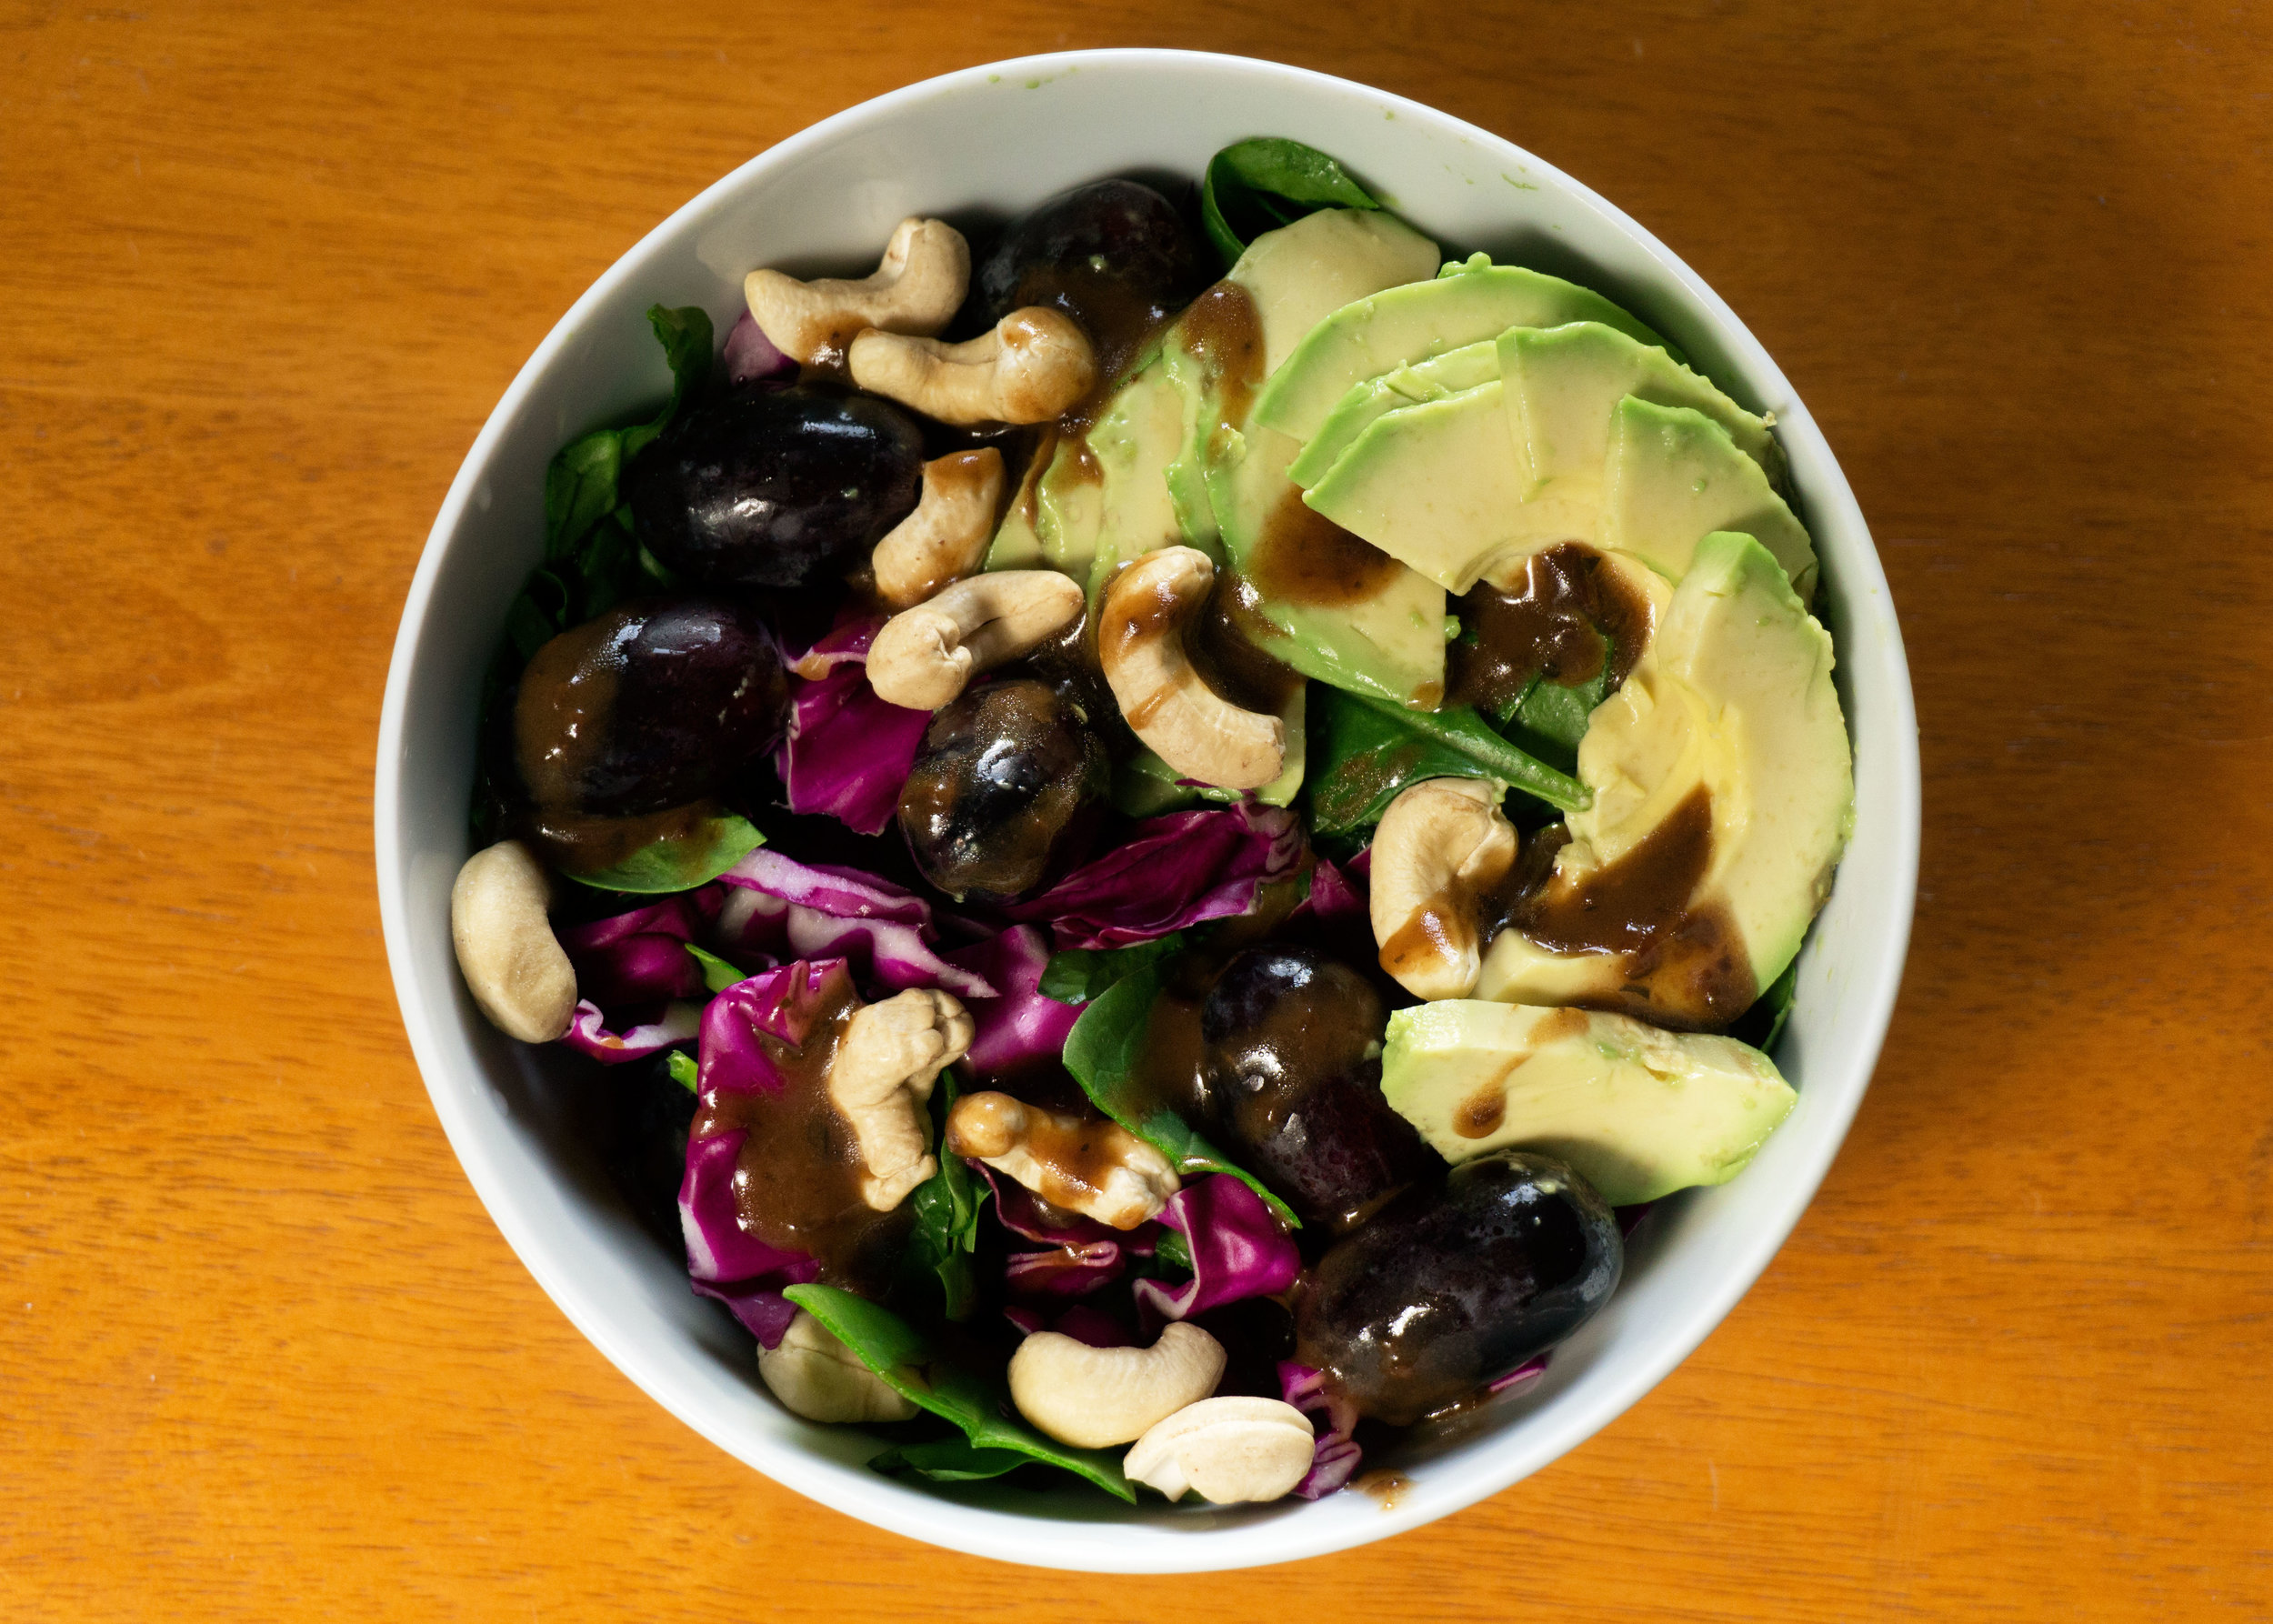 Salad #3